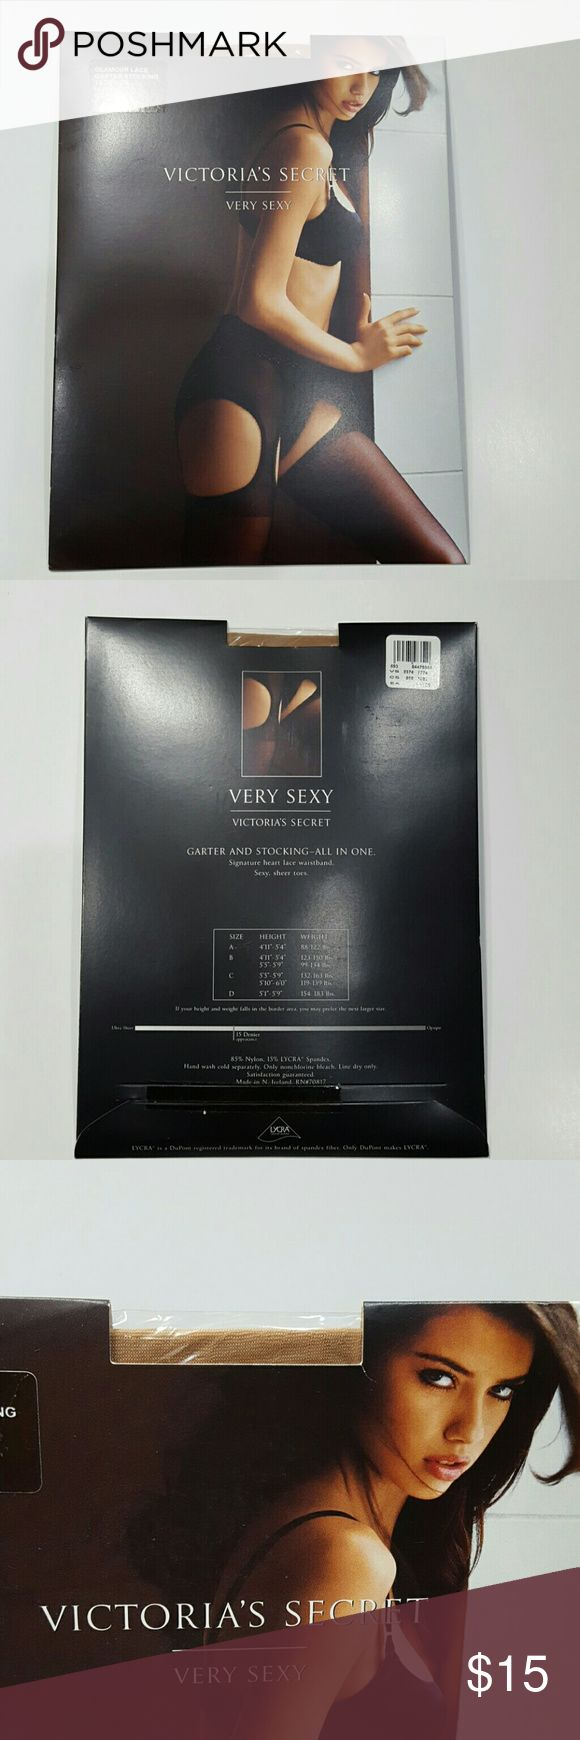 Victoria's Secret Garter Stockings Glamour Lace Garter Stockings, Nude color, Size B Victoria's Secret Intimates & Sleepwear Shapewear